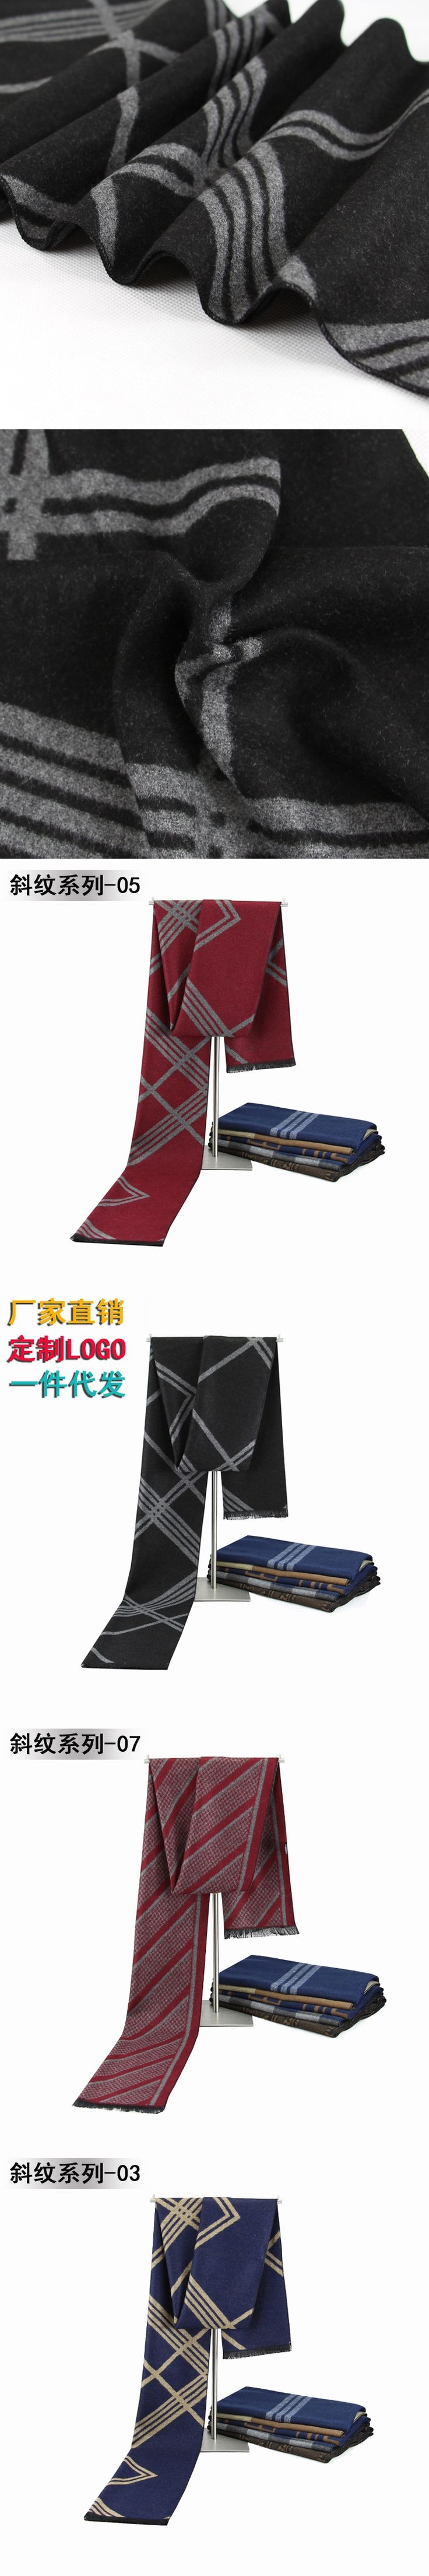 2016 Autumn Winter New Korean Business Scarf Wholesale Adults Men's Scarfs Cotton Lattice Striped Scarves Longer Jacquard Shawl